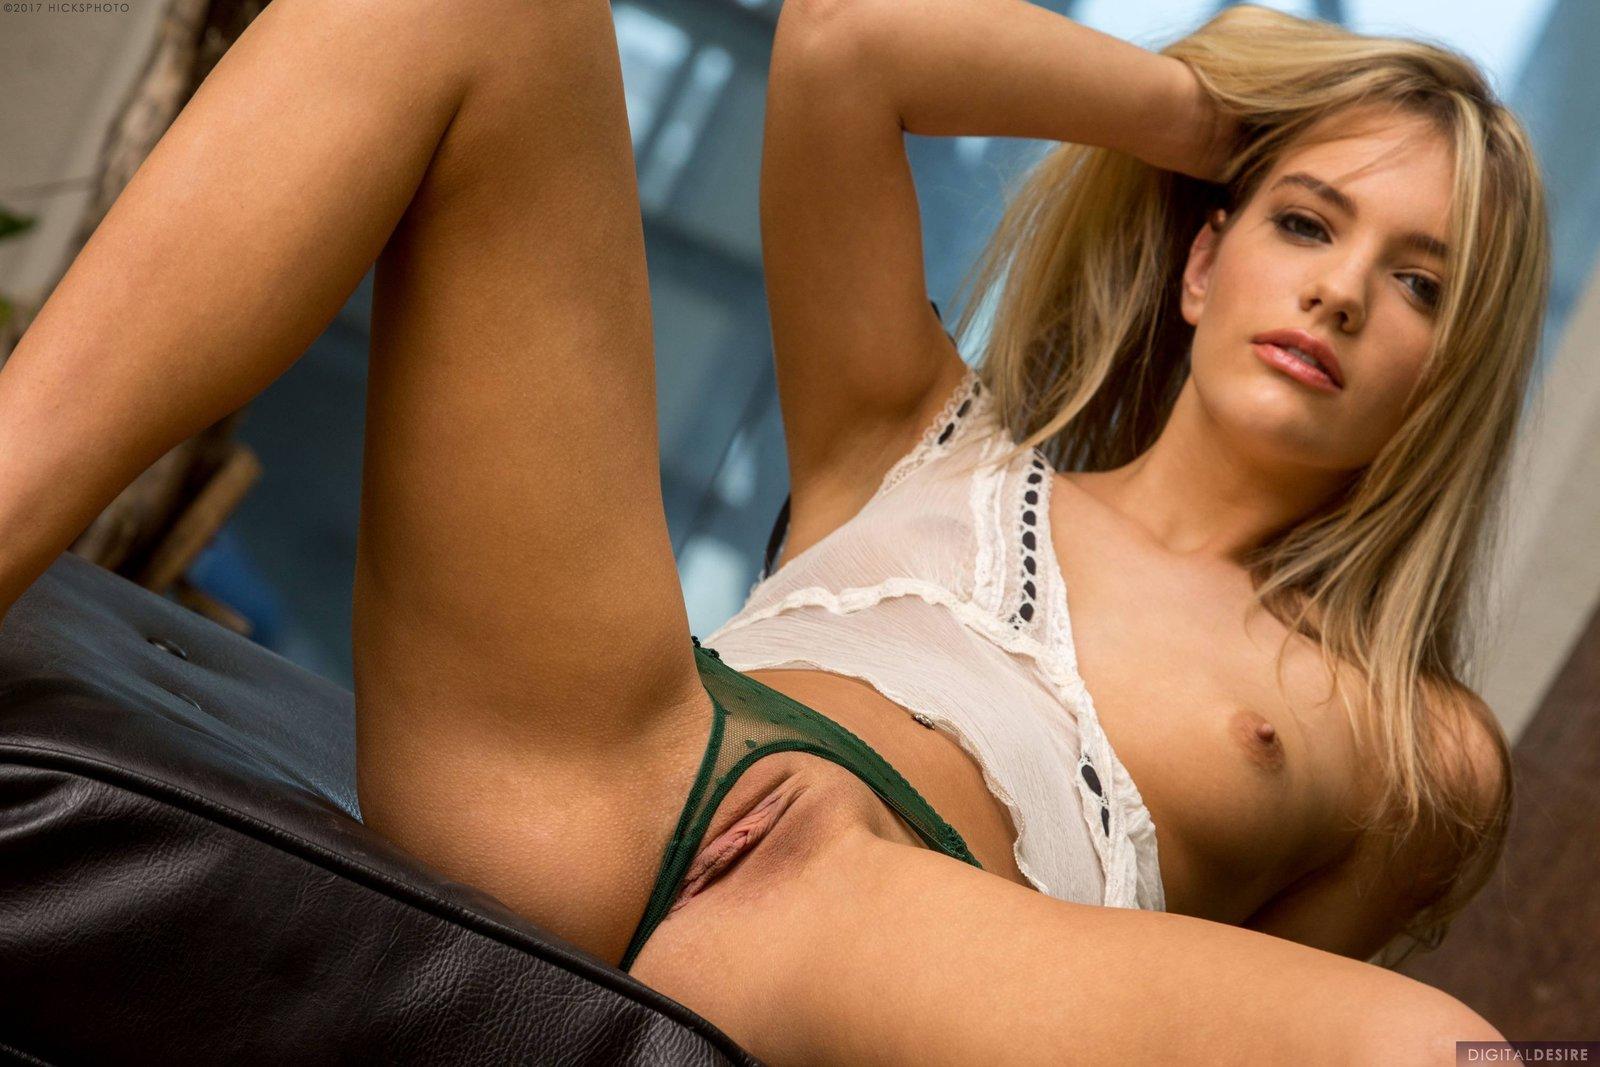 Kenna James In Dream Girl By Digital Desire 12 Photos -9869